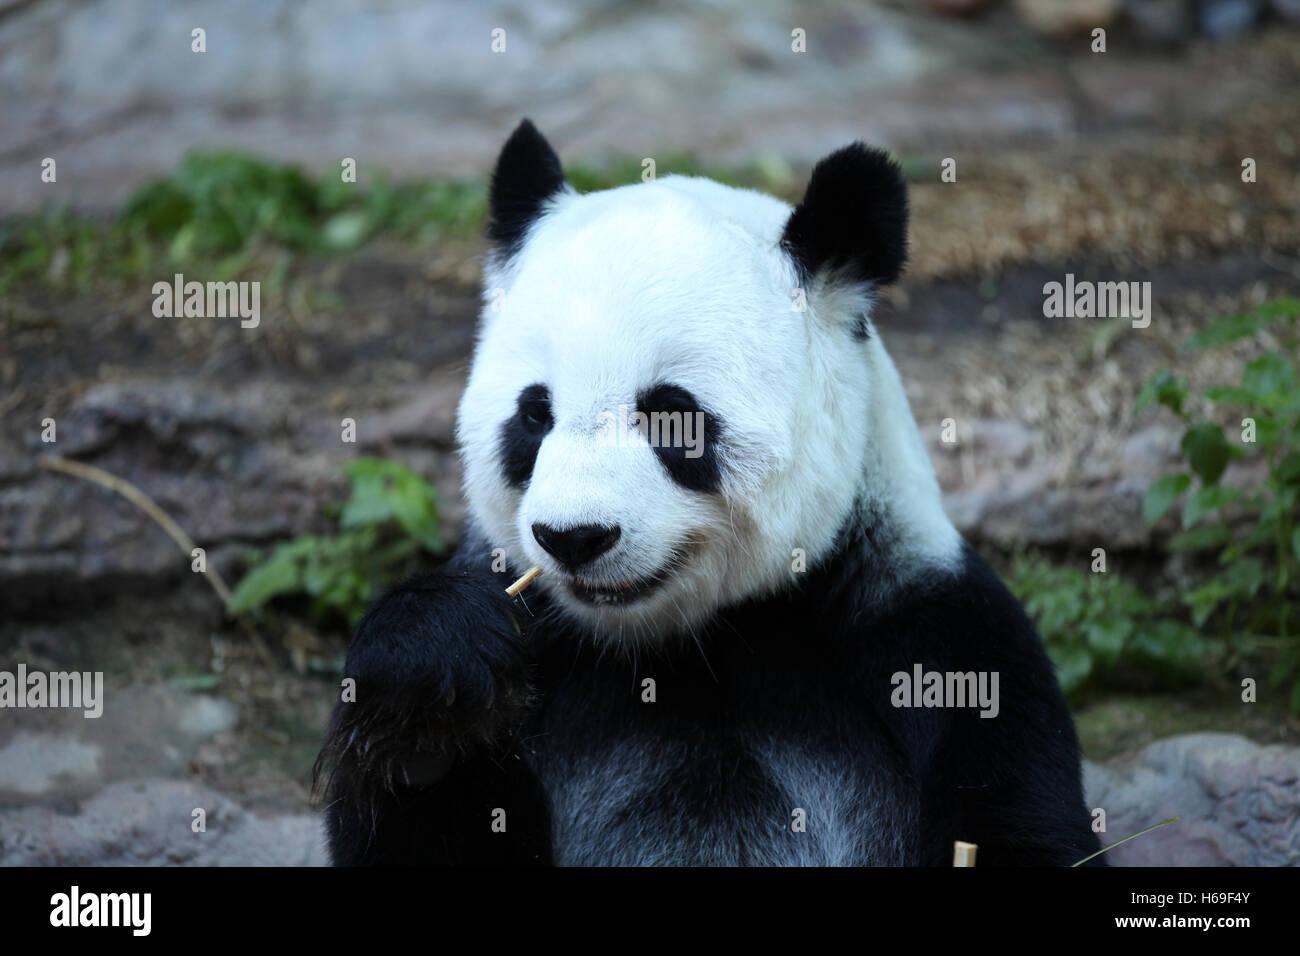 bamboo bear or a giant panda, Thailand, Southeast Asia - Stock Image